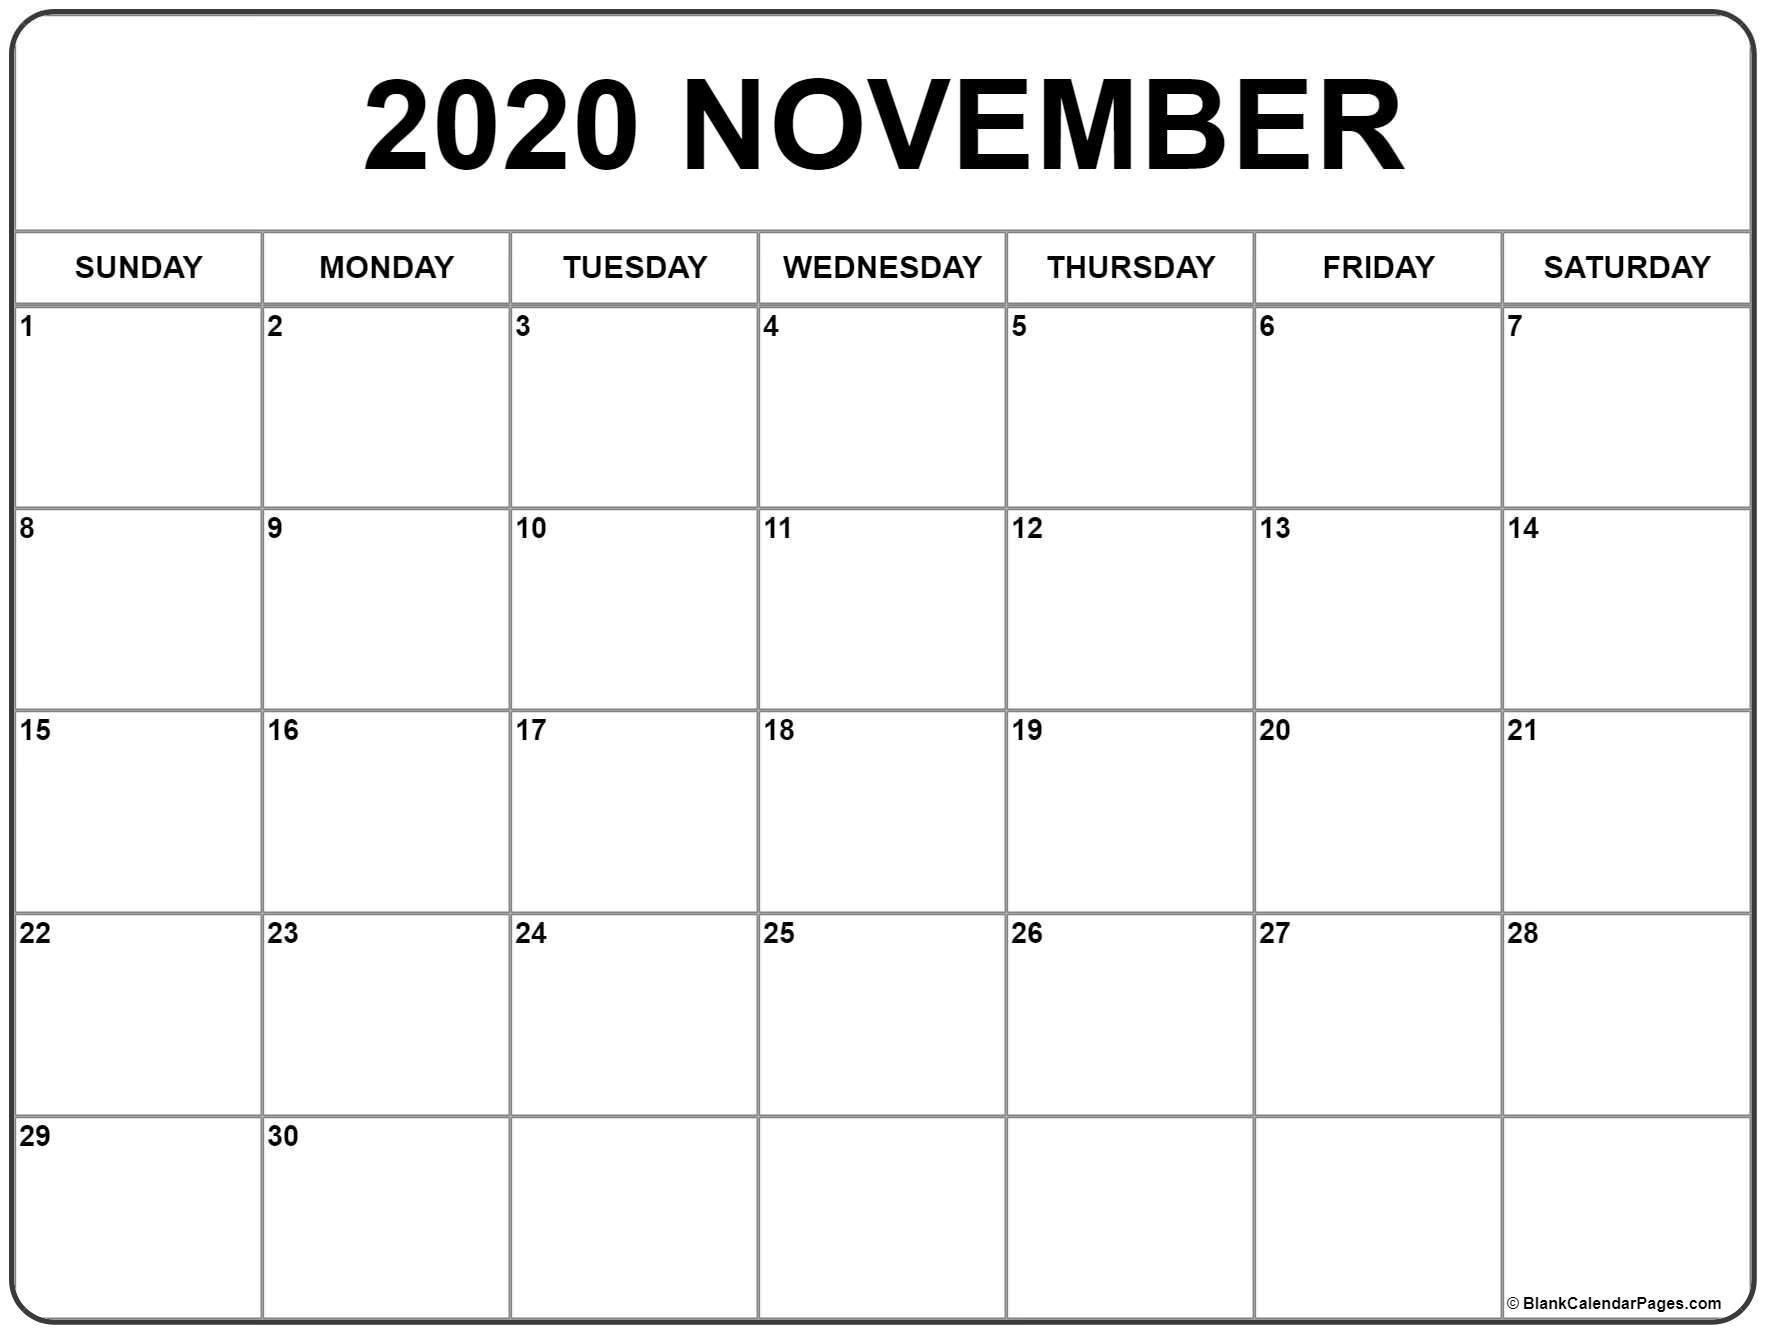 November 2020 Calendar Cute - Wpa.wpart.co